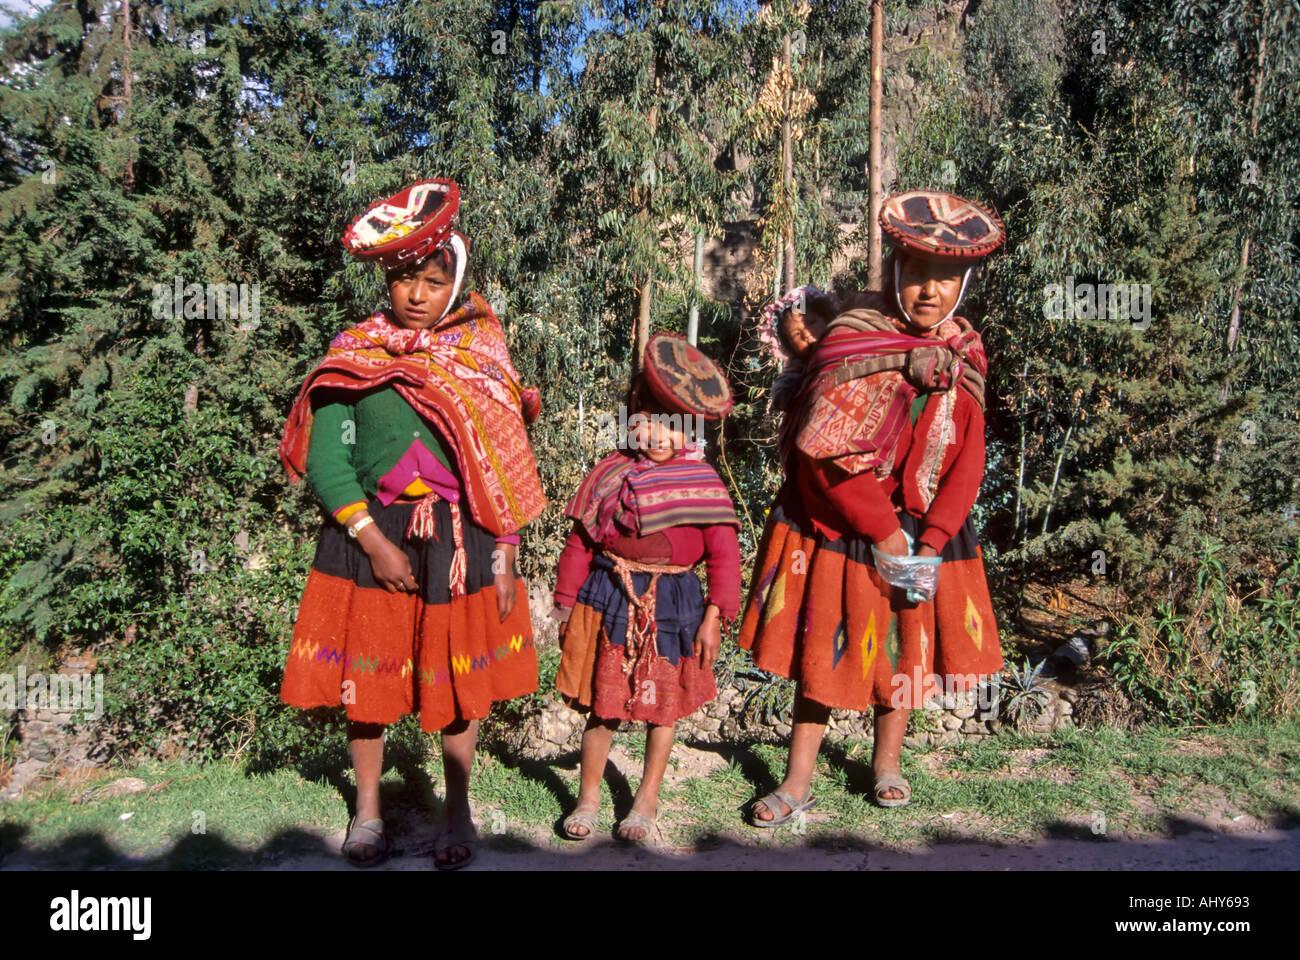 Quechua Indian women, Ollantaytambo, Peru - Stock Image